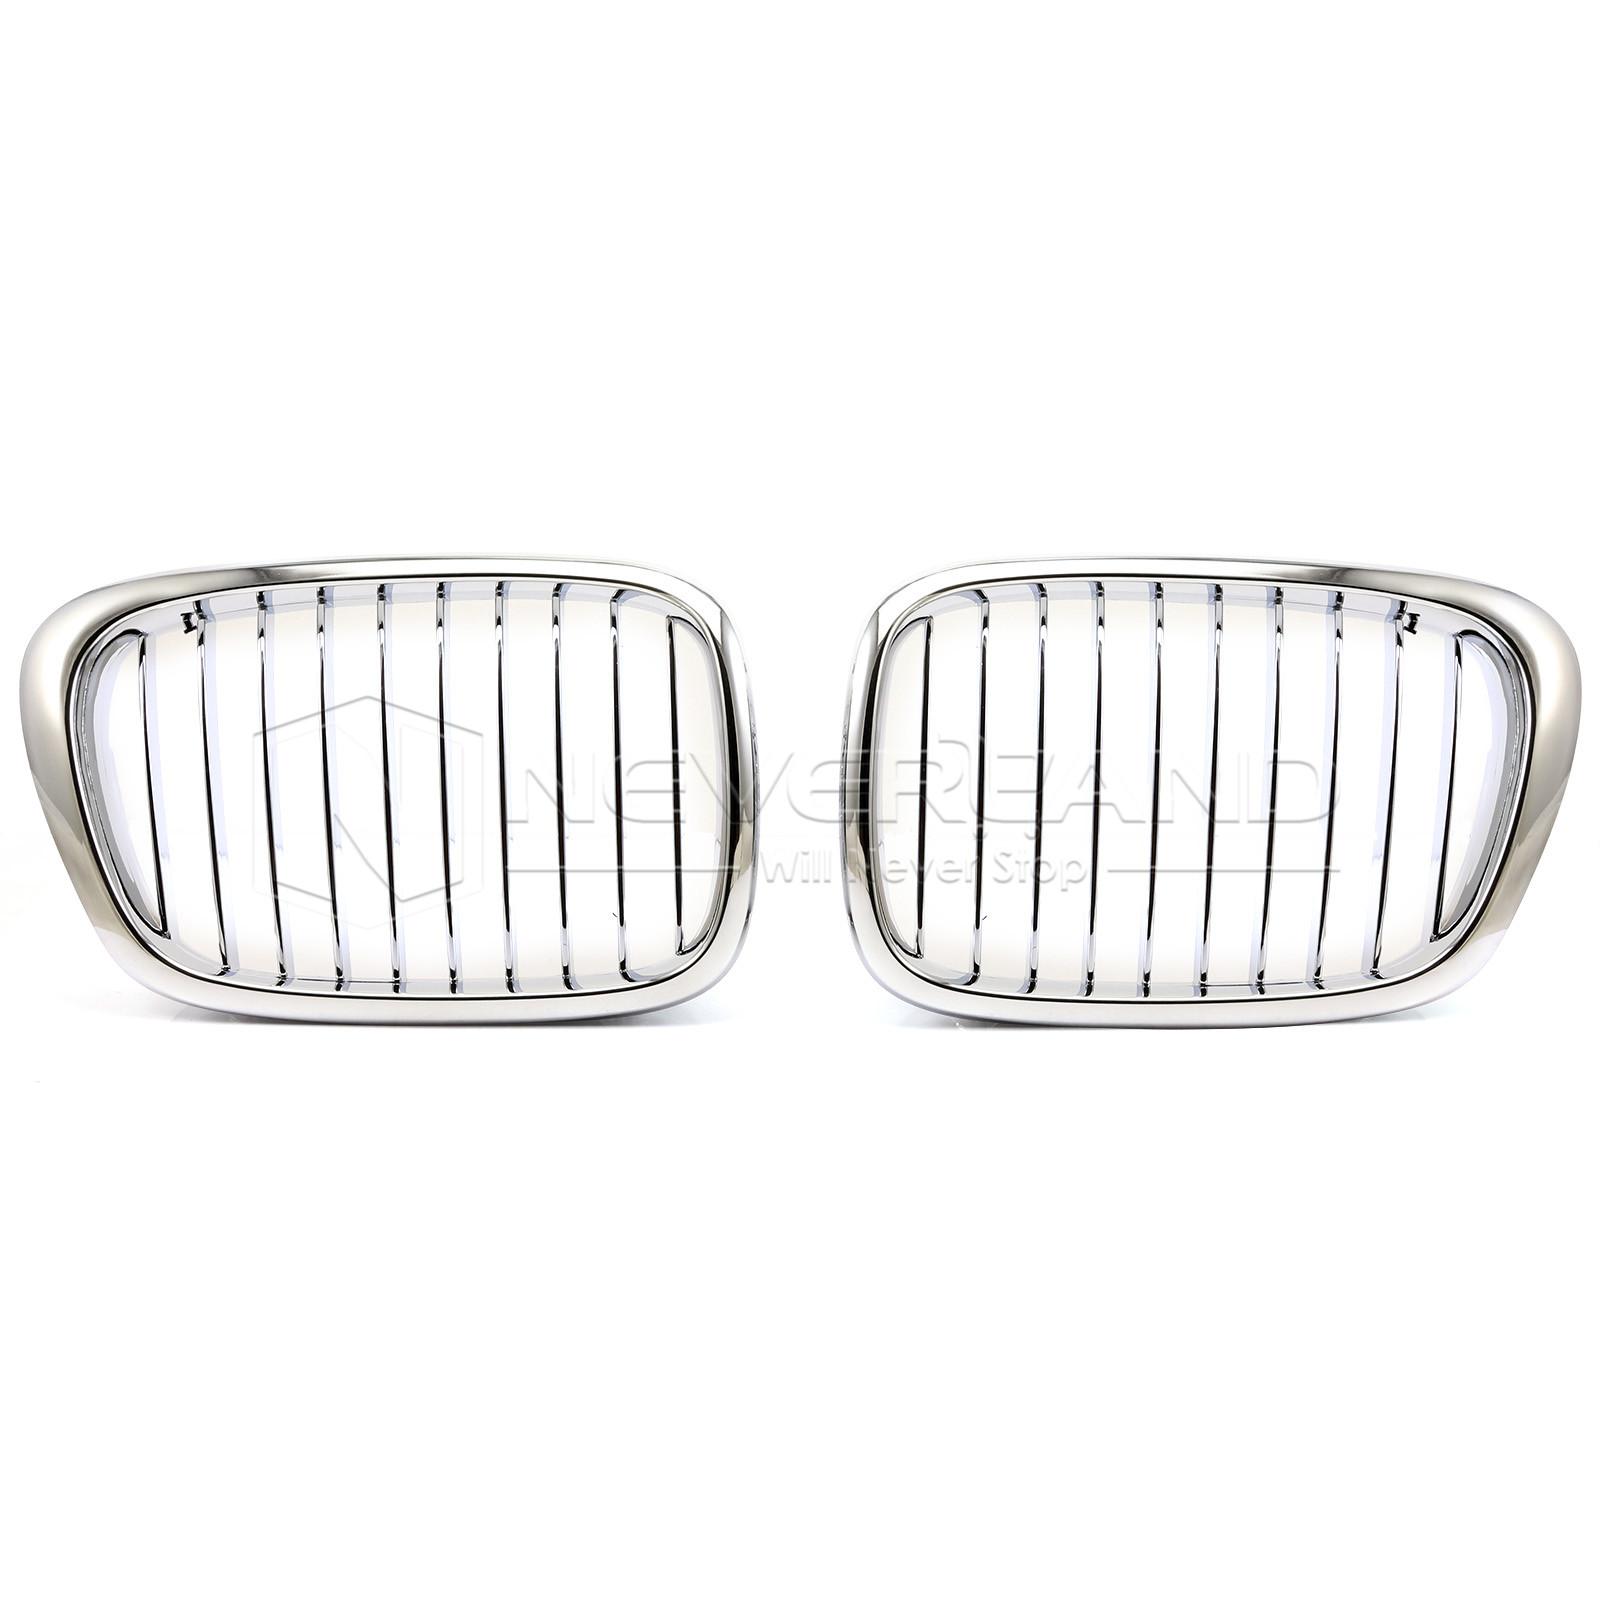 2pcs Car Front Bumper Kidney Grille 10 Bar Silver For Bmw